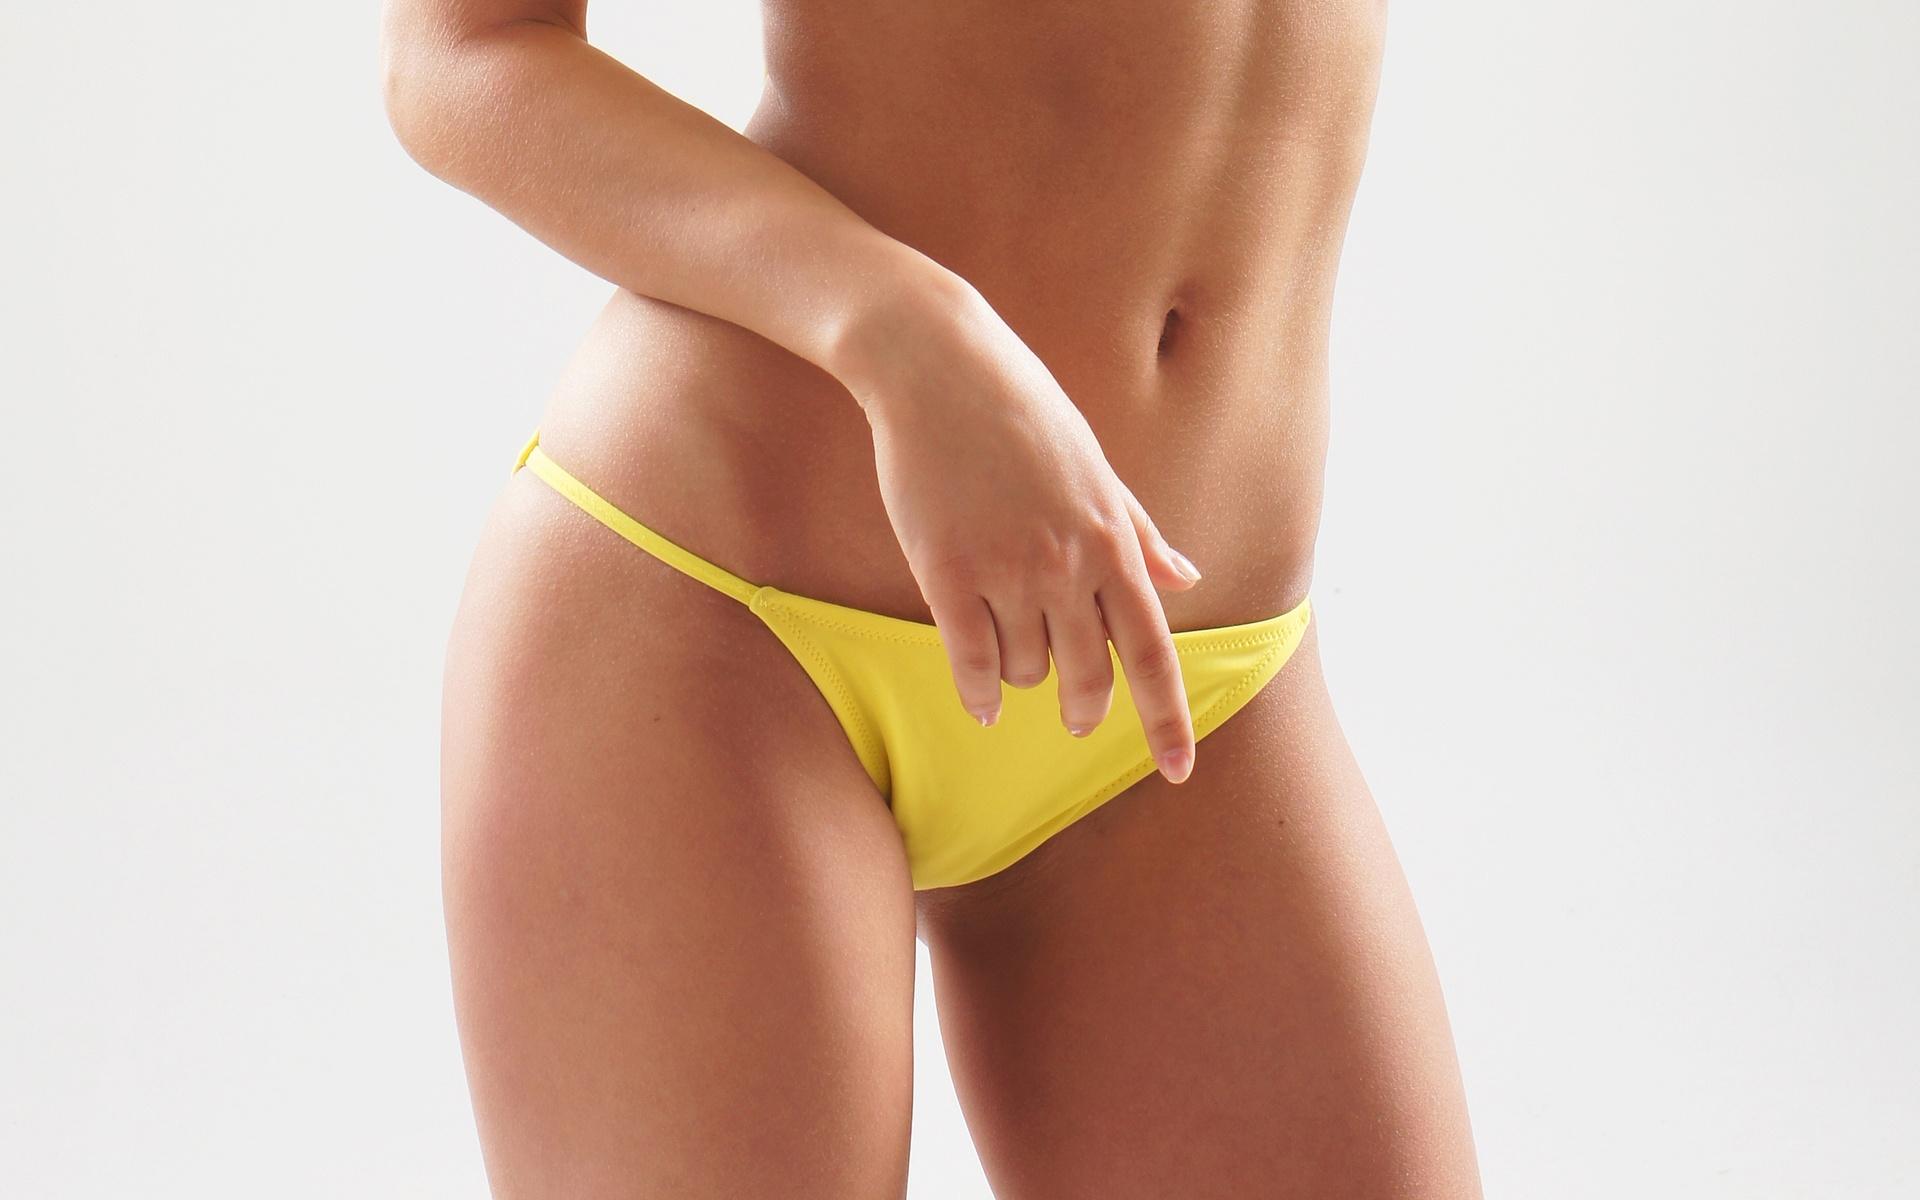 zona-bikini-golaya